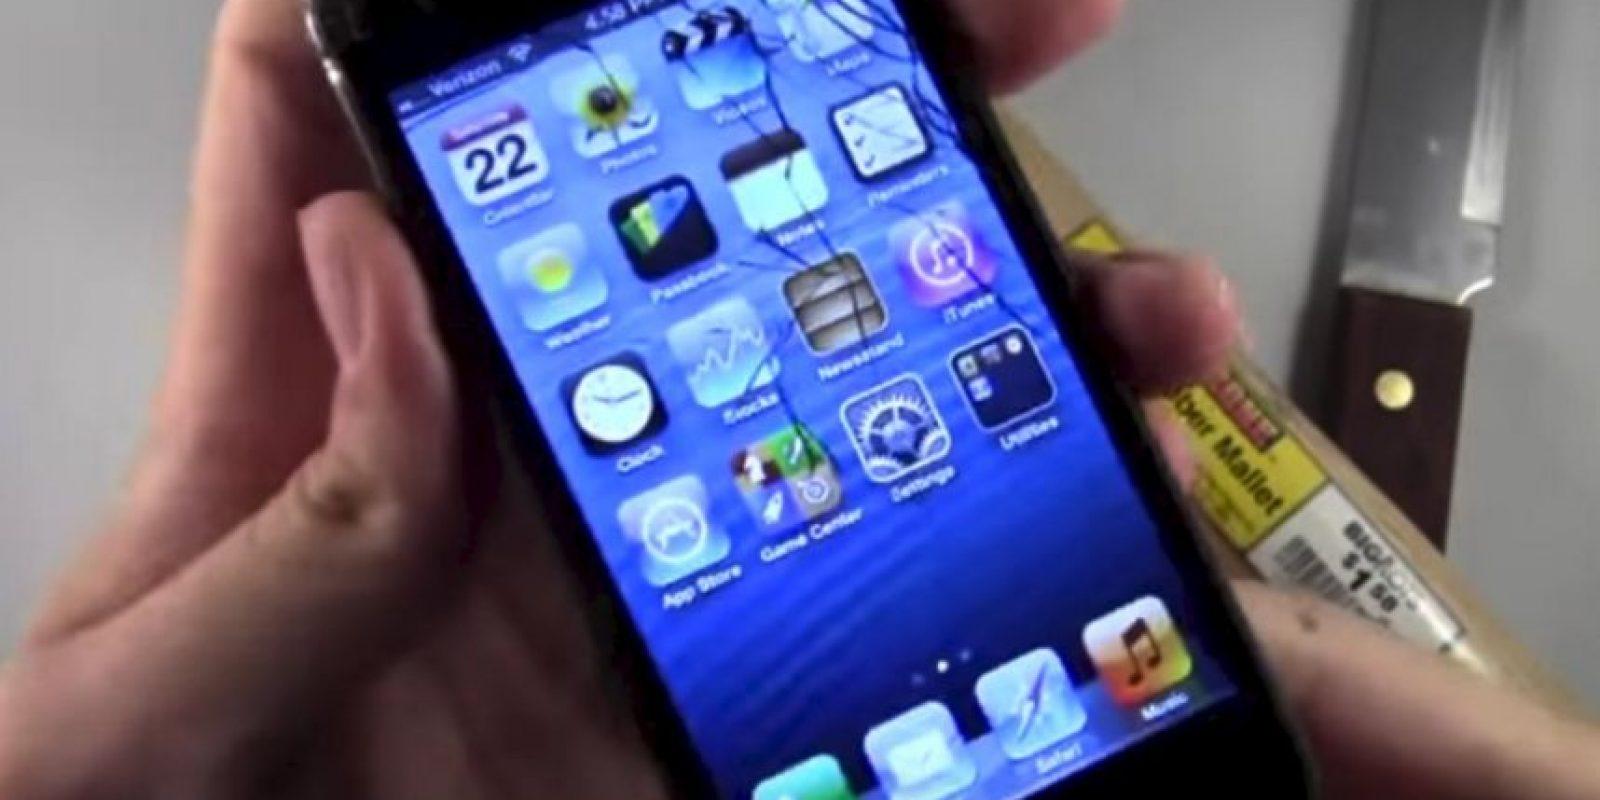 iPhone 5 Foto:PhoneBuff / YouTube